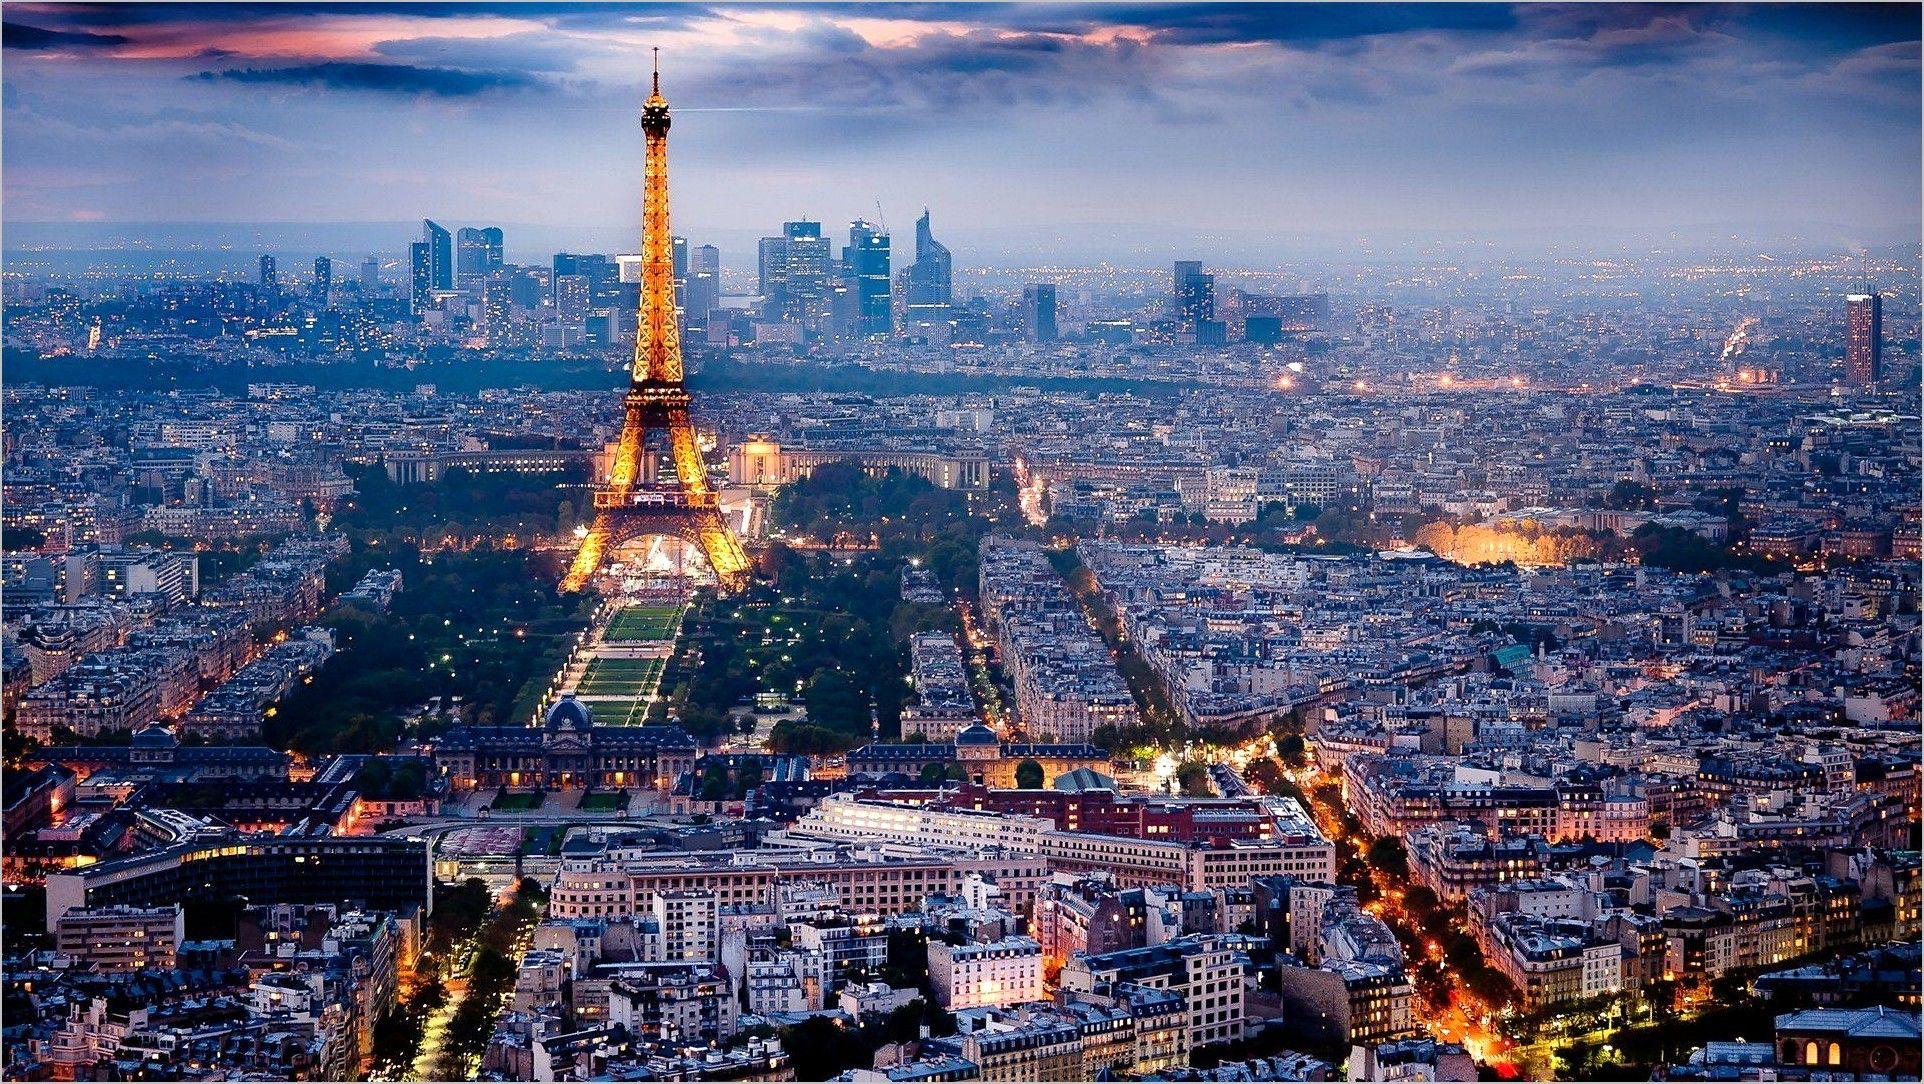 4k Wallpaper 1920 1080 In 2020 Paris Wallpaper Paris Background City Wallpaper